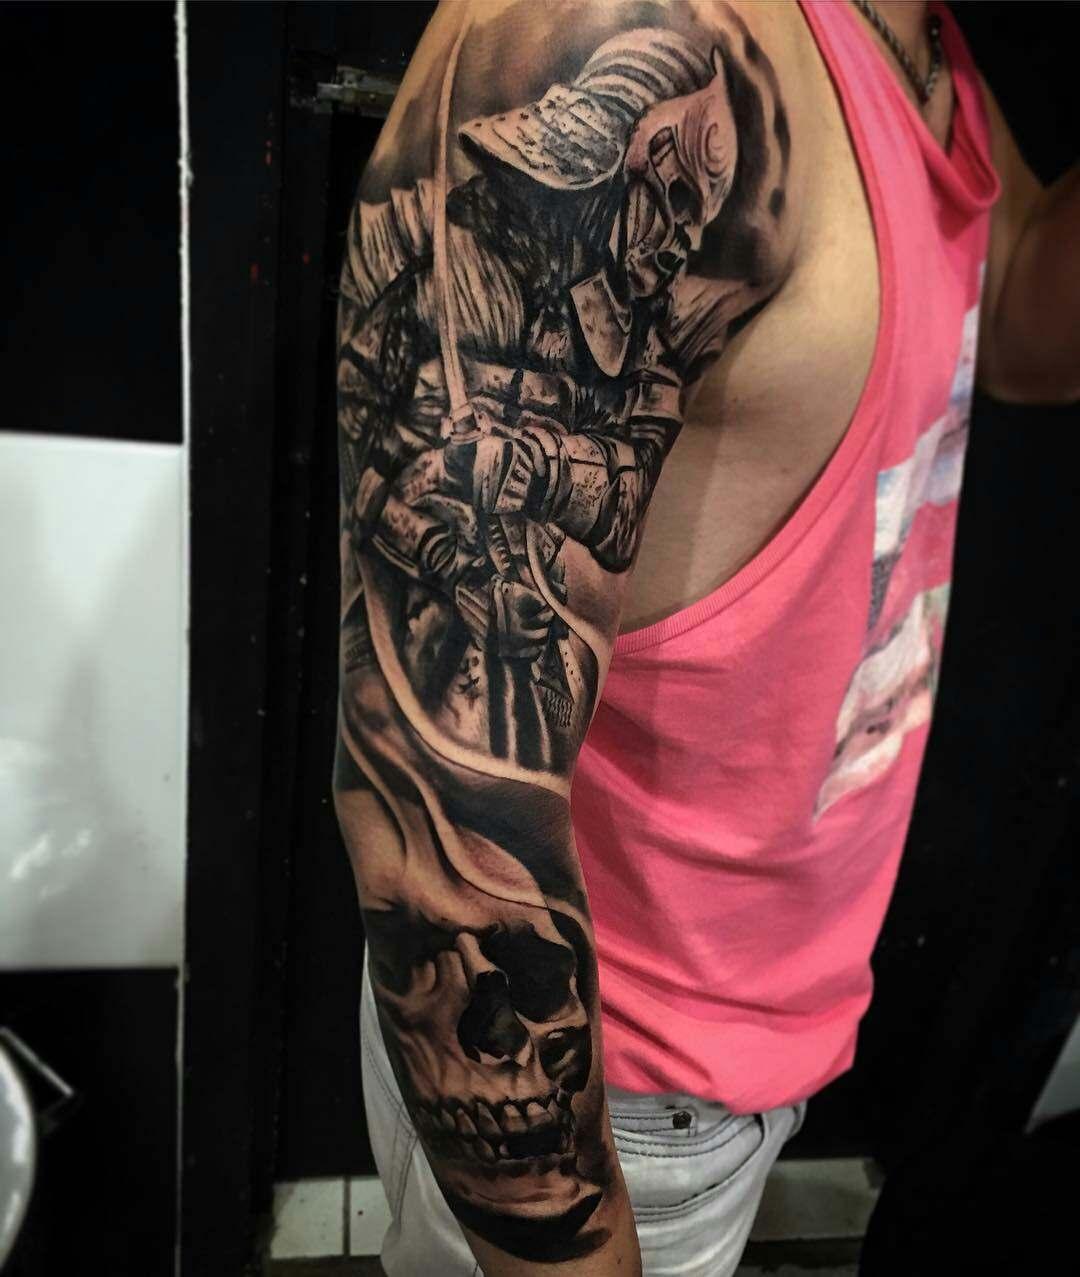 980 Ideas de Tatuajes Para Hombres Muy Varoniles